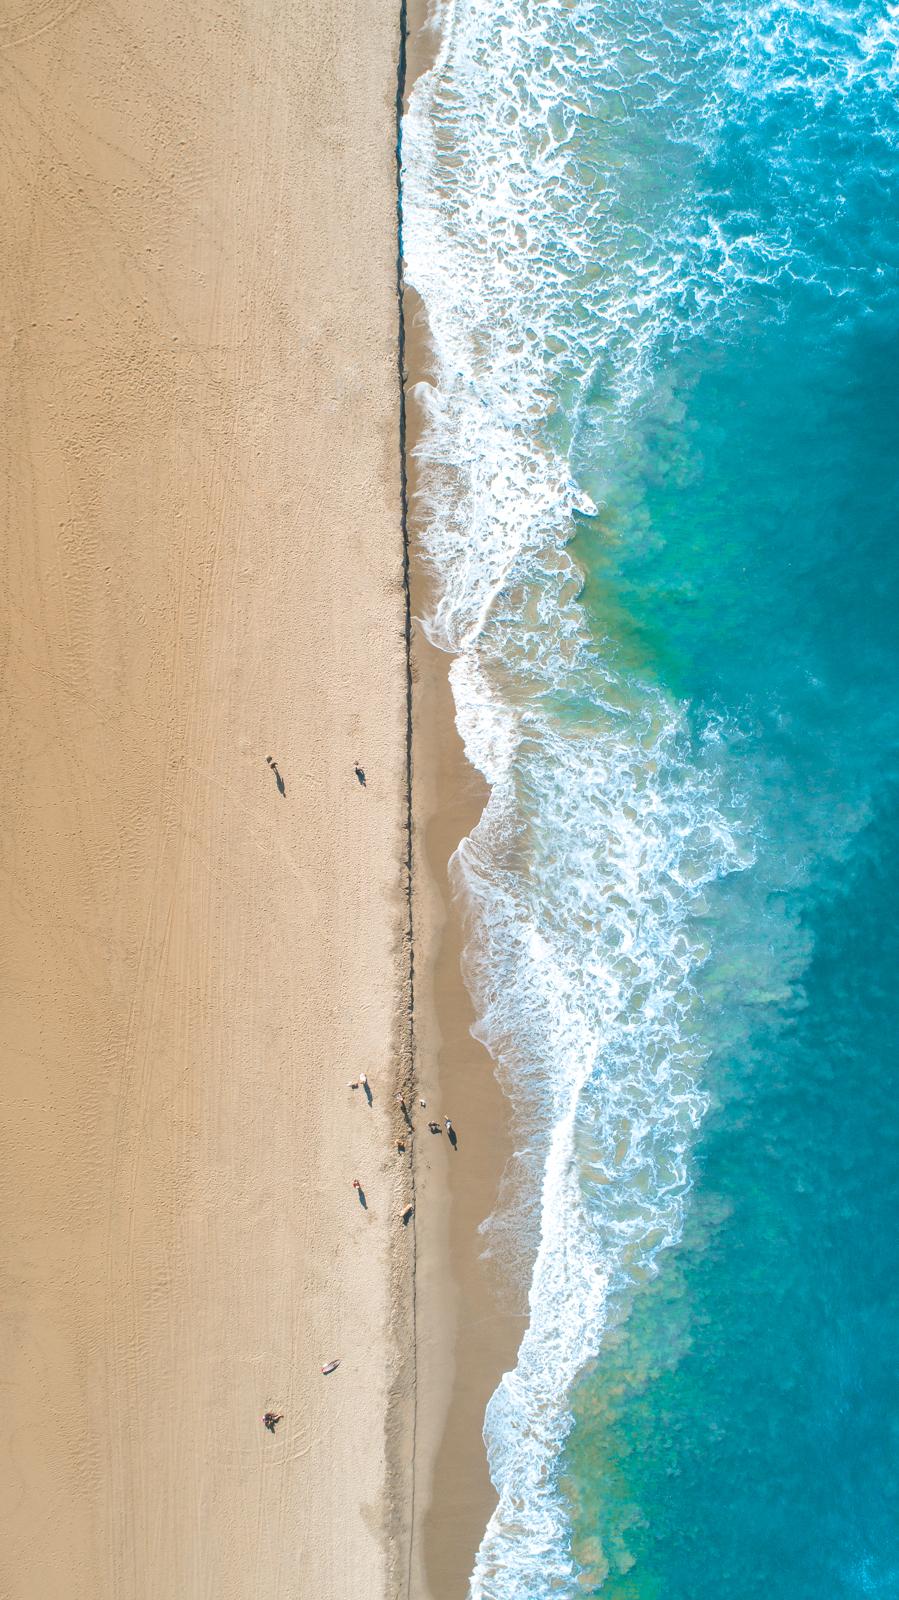 ABE1_Drone_Newport_Beach-2-2.jpg